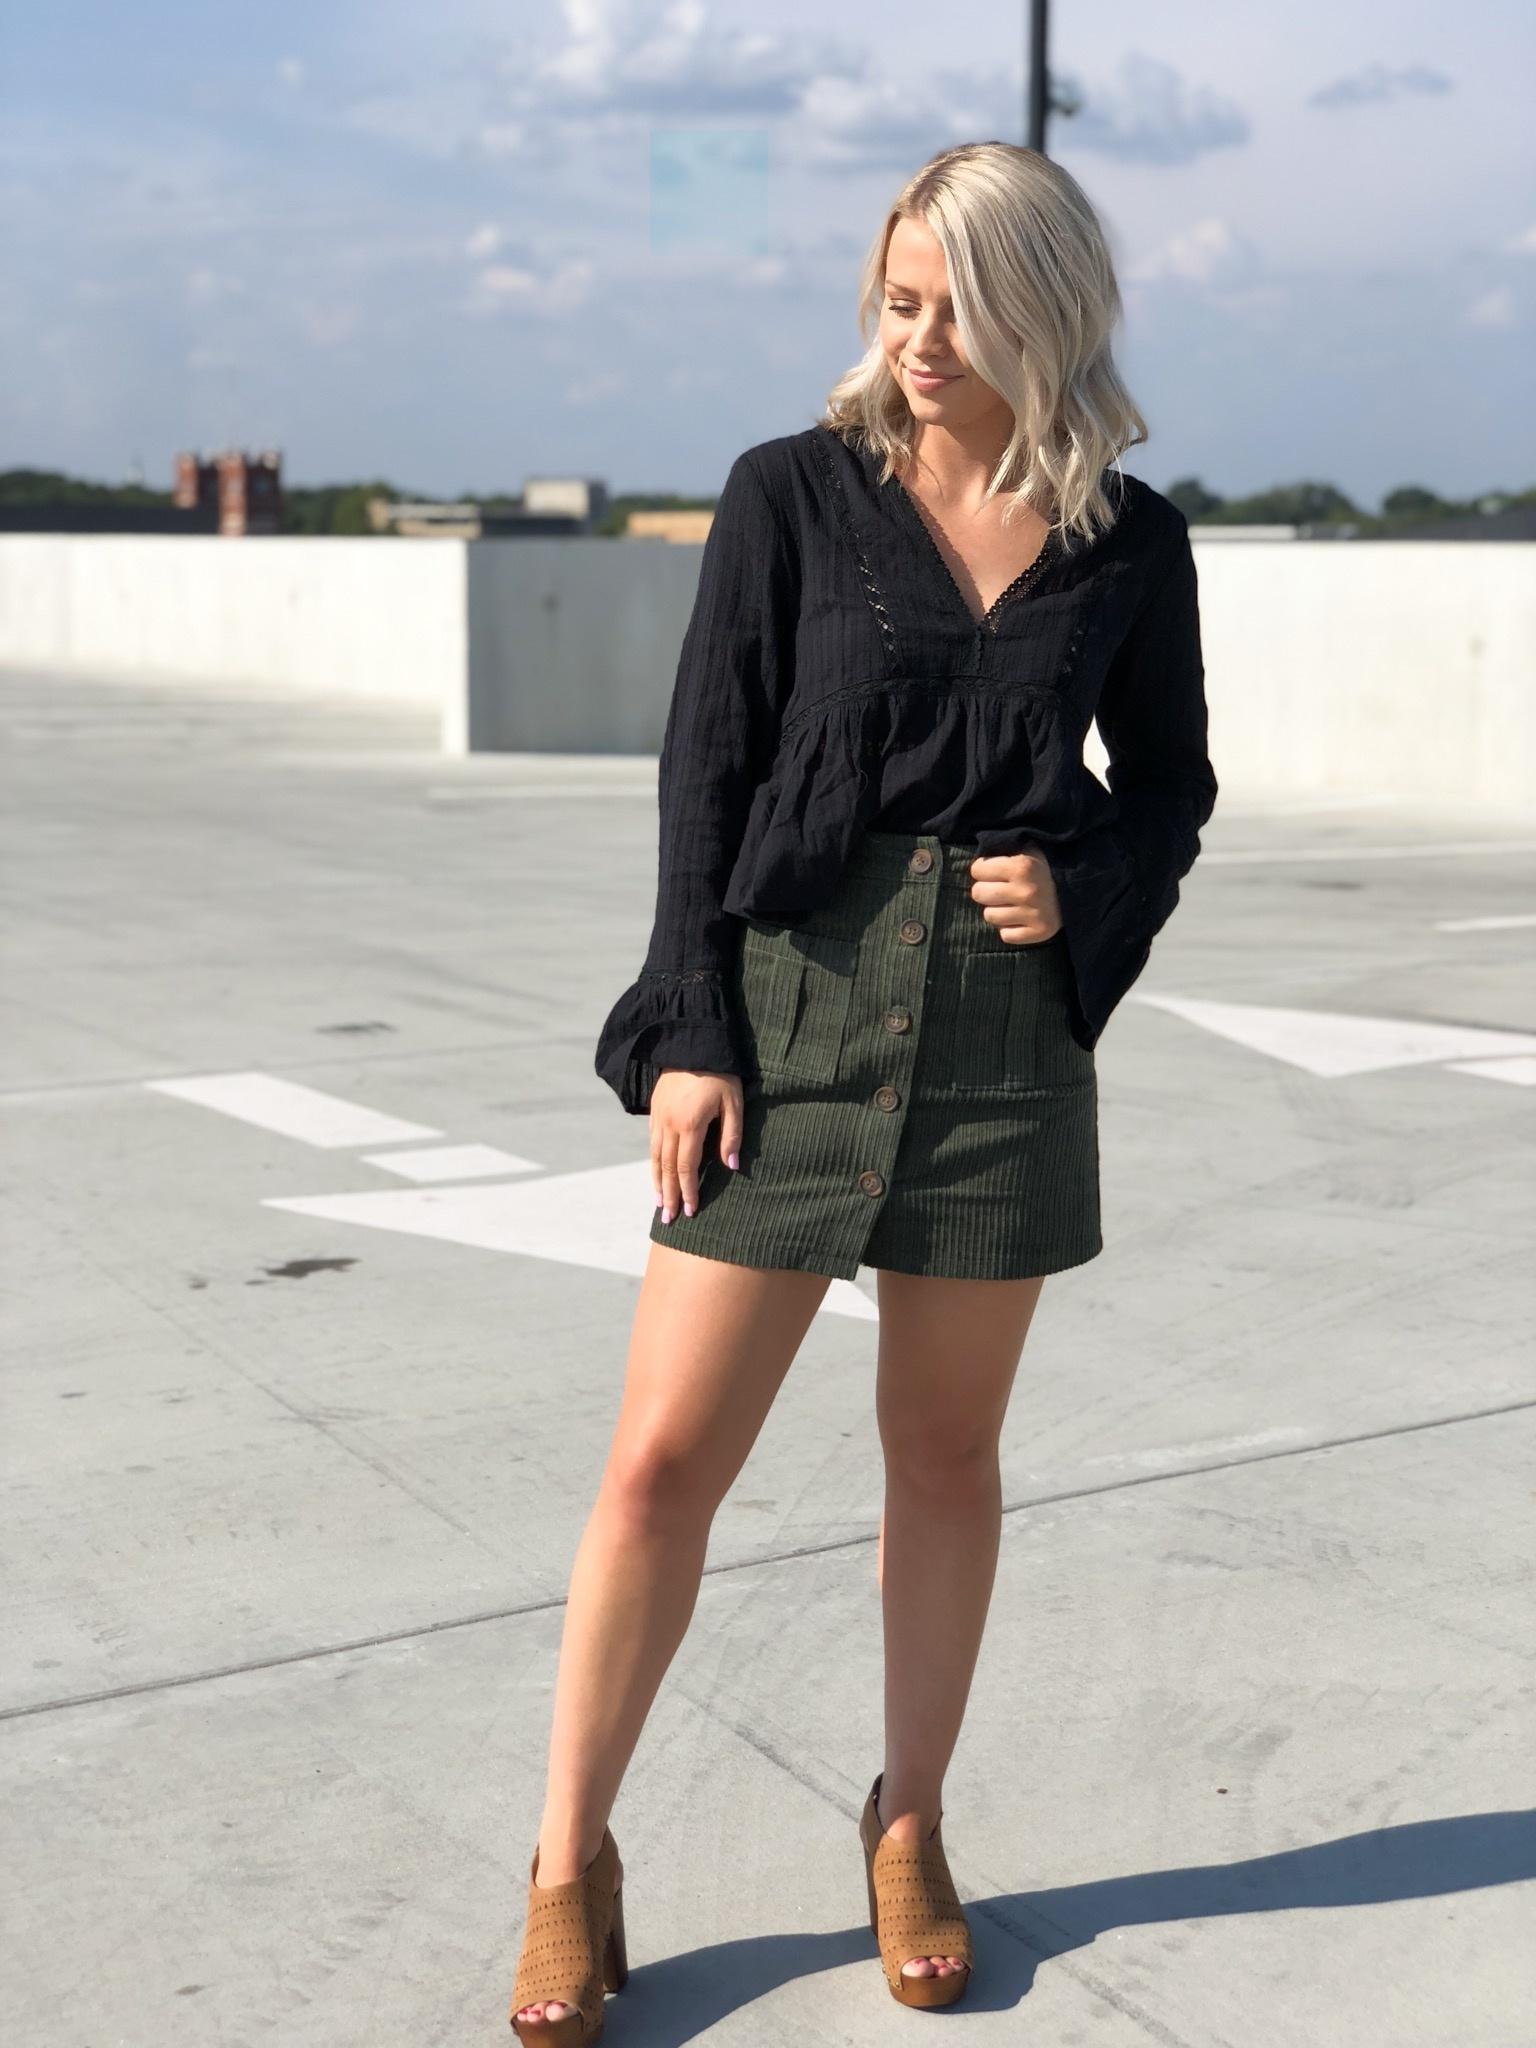 Black peplum top w/bell sleeves and crochet detail